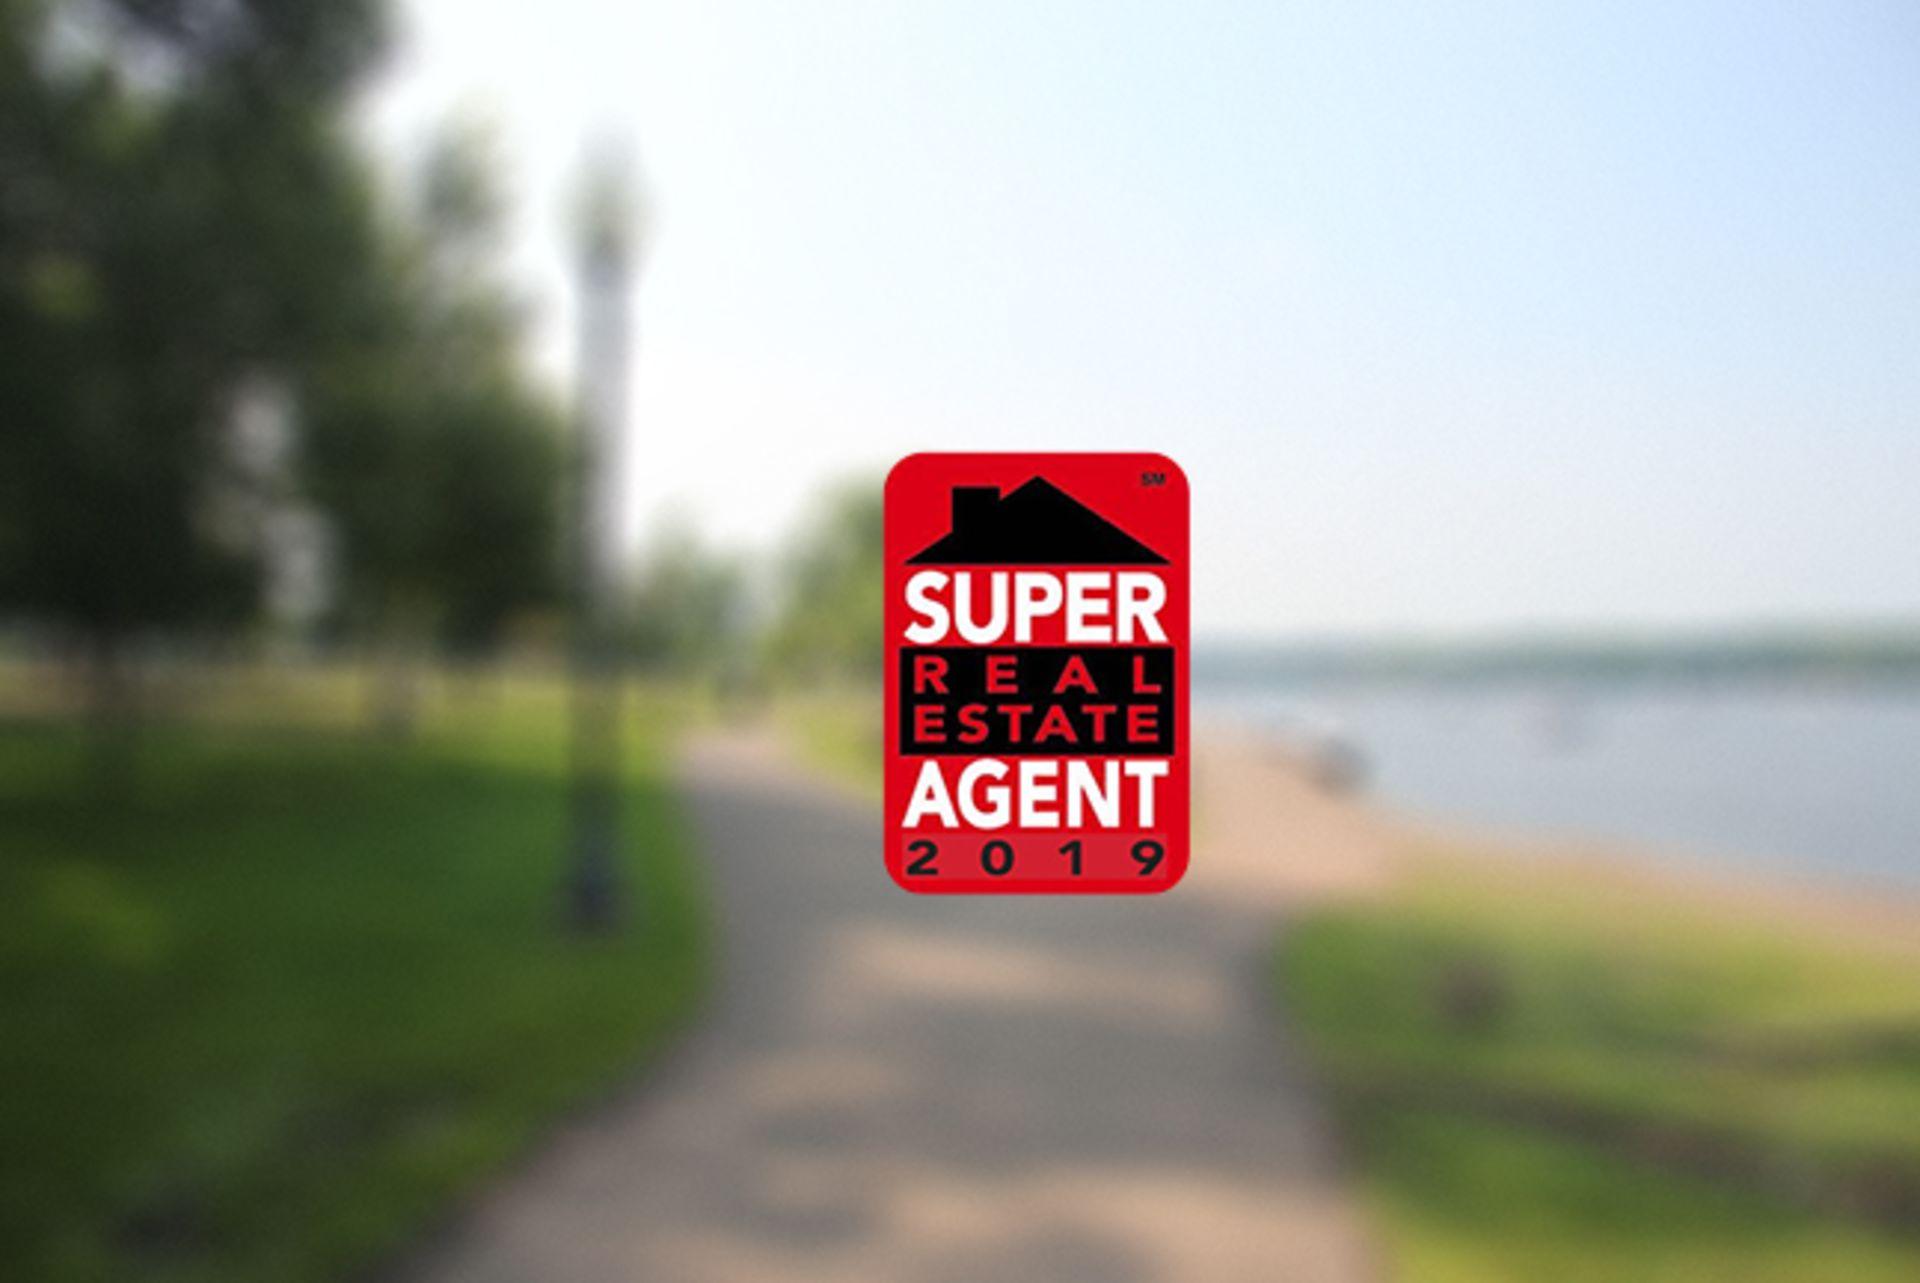 Super Real Estate Agent 2019